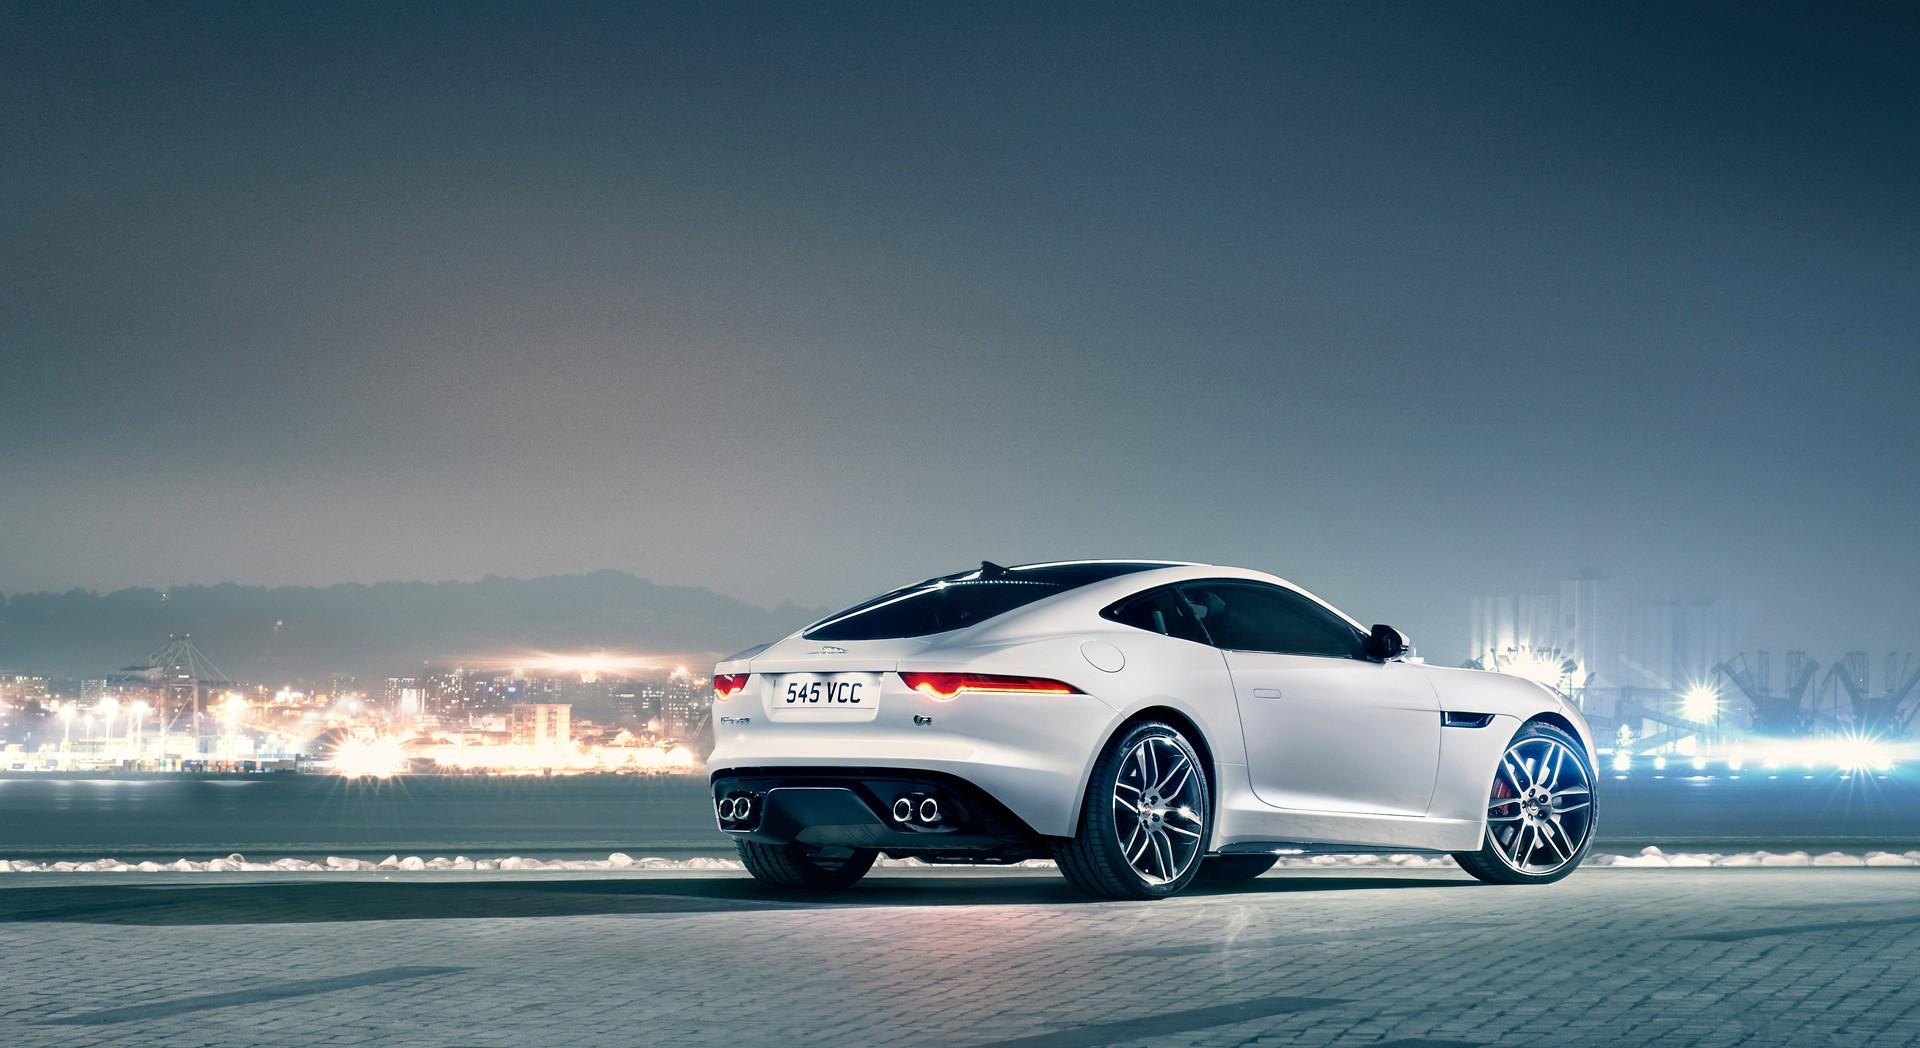 Jaguar Car Live Wallpaper Download Jaguar F Type R Coupe Hd Desktop Wallpapers 4k Hd